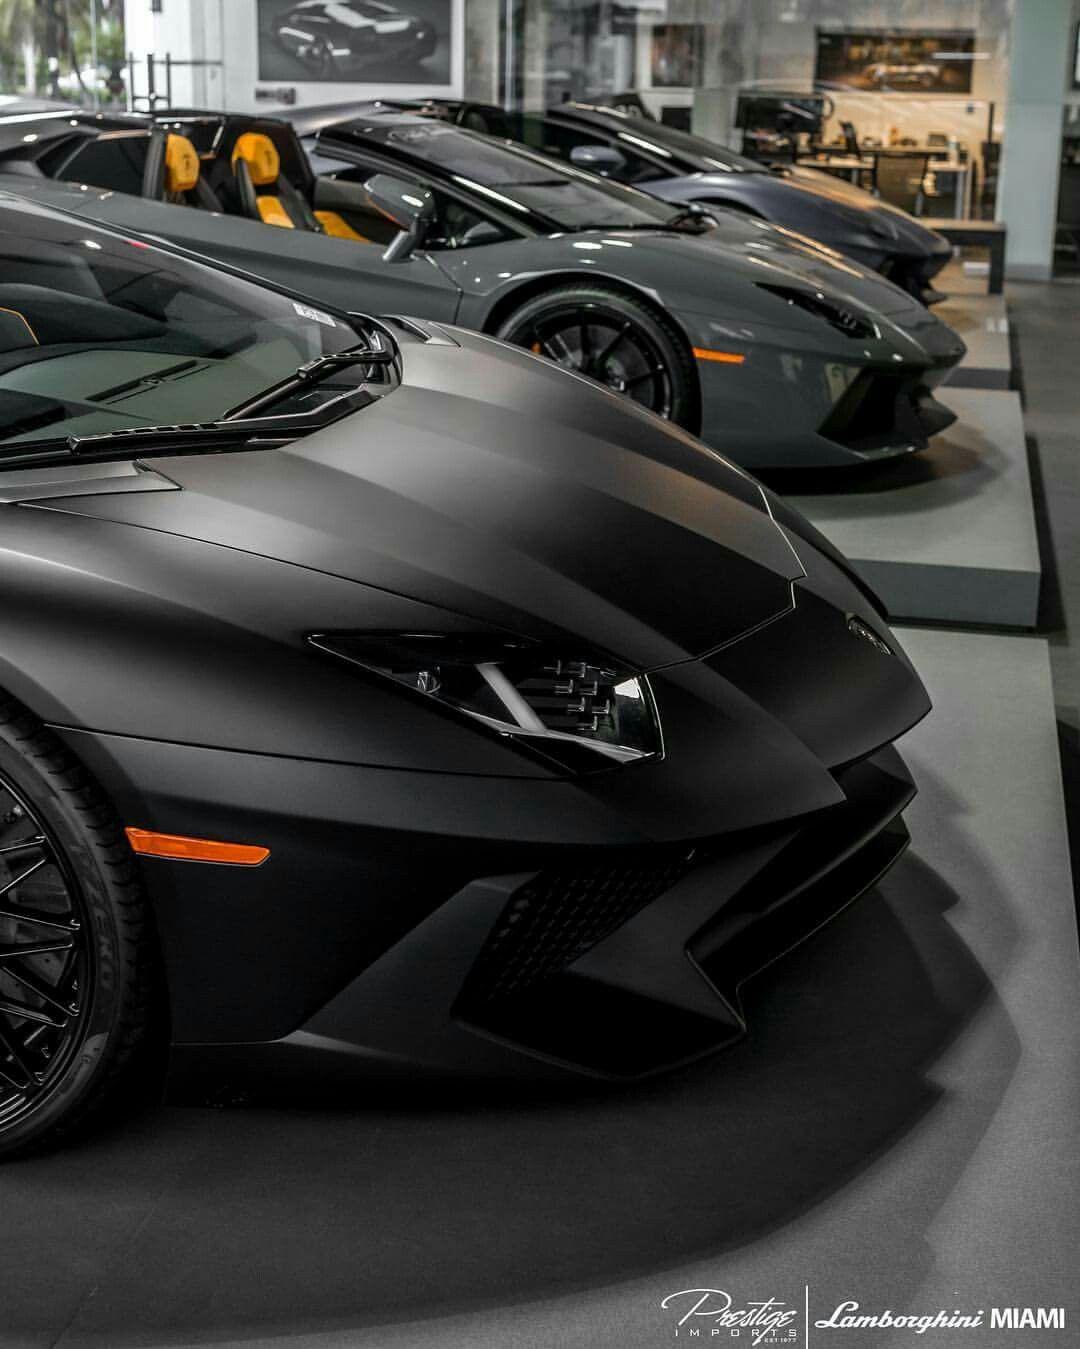 Sw Sports Car Koenigsegg Toyota: Lamborghini, Sports Car, Car